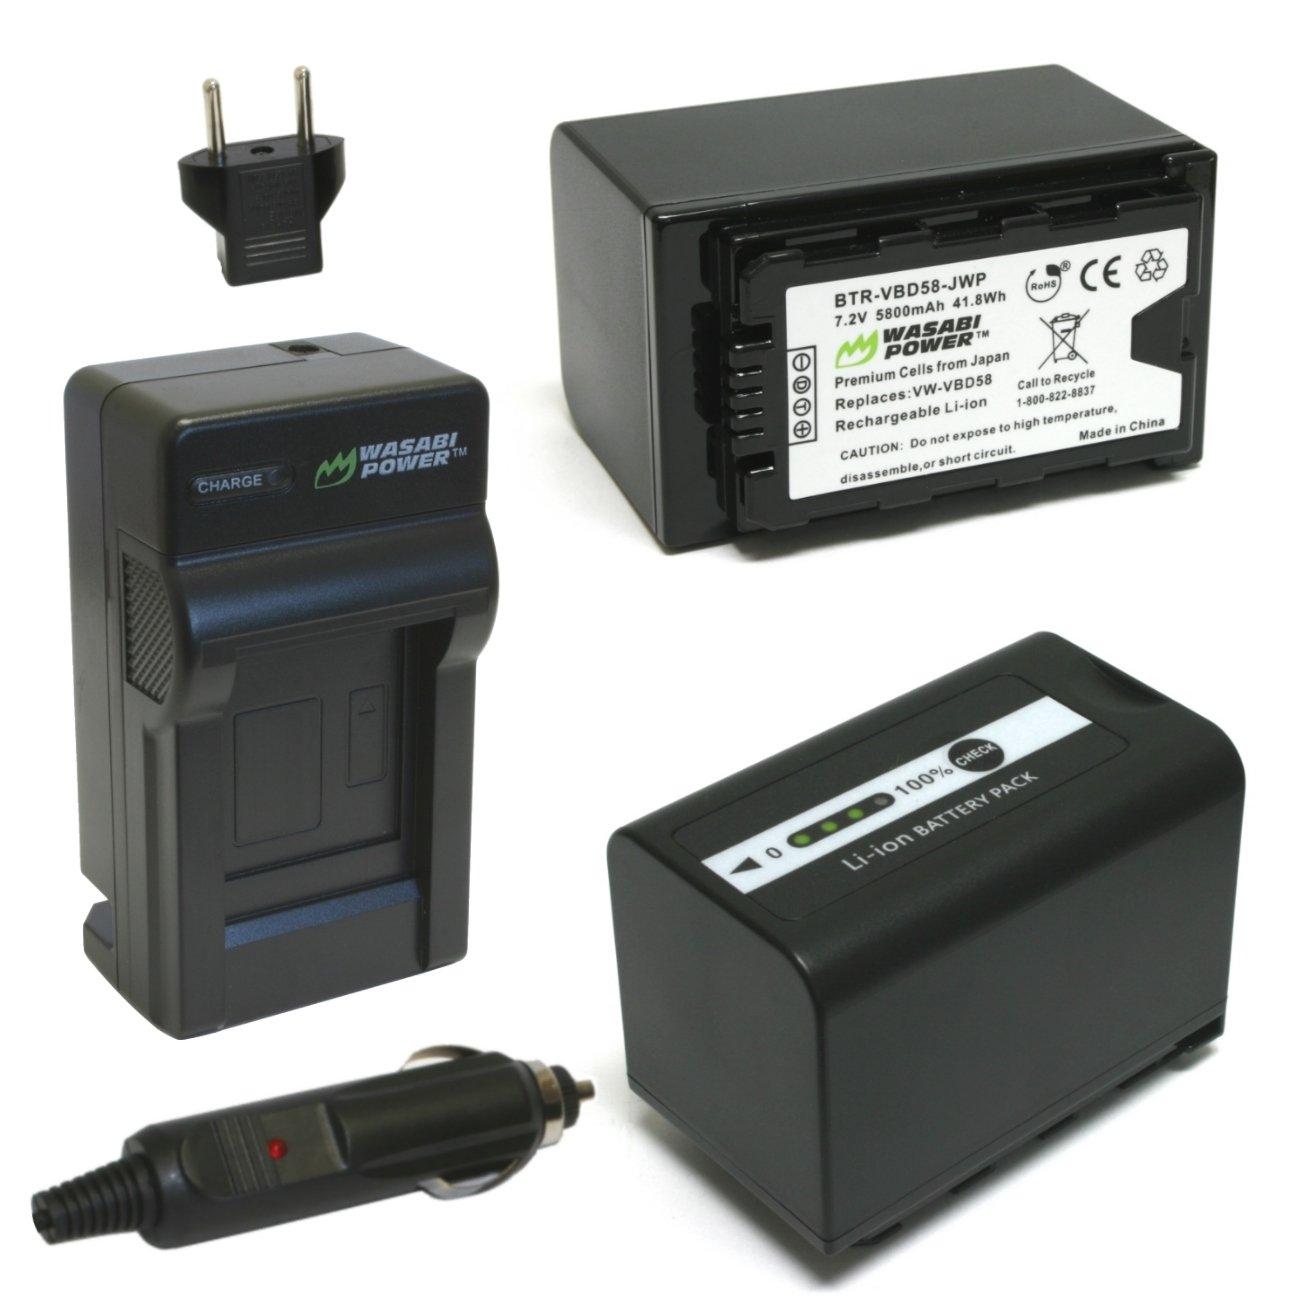 Wasabi Powerバッテリーと充電器for Panasonic vw-vbd29、vw-vbd55、vw-vbd58、vw-vbd78 B00QHNS7YU  Charger + 2 Batteries (VBD58)